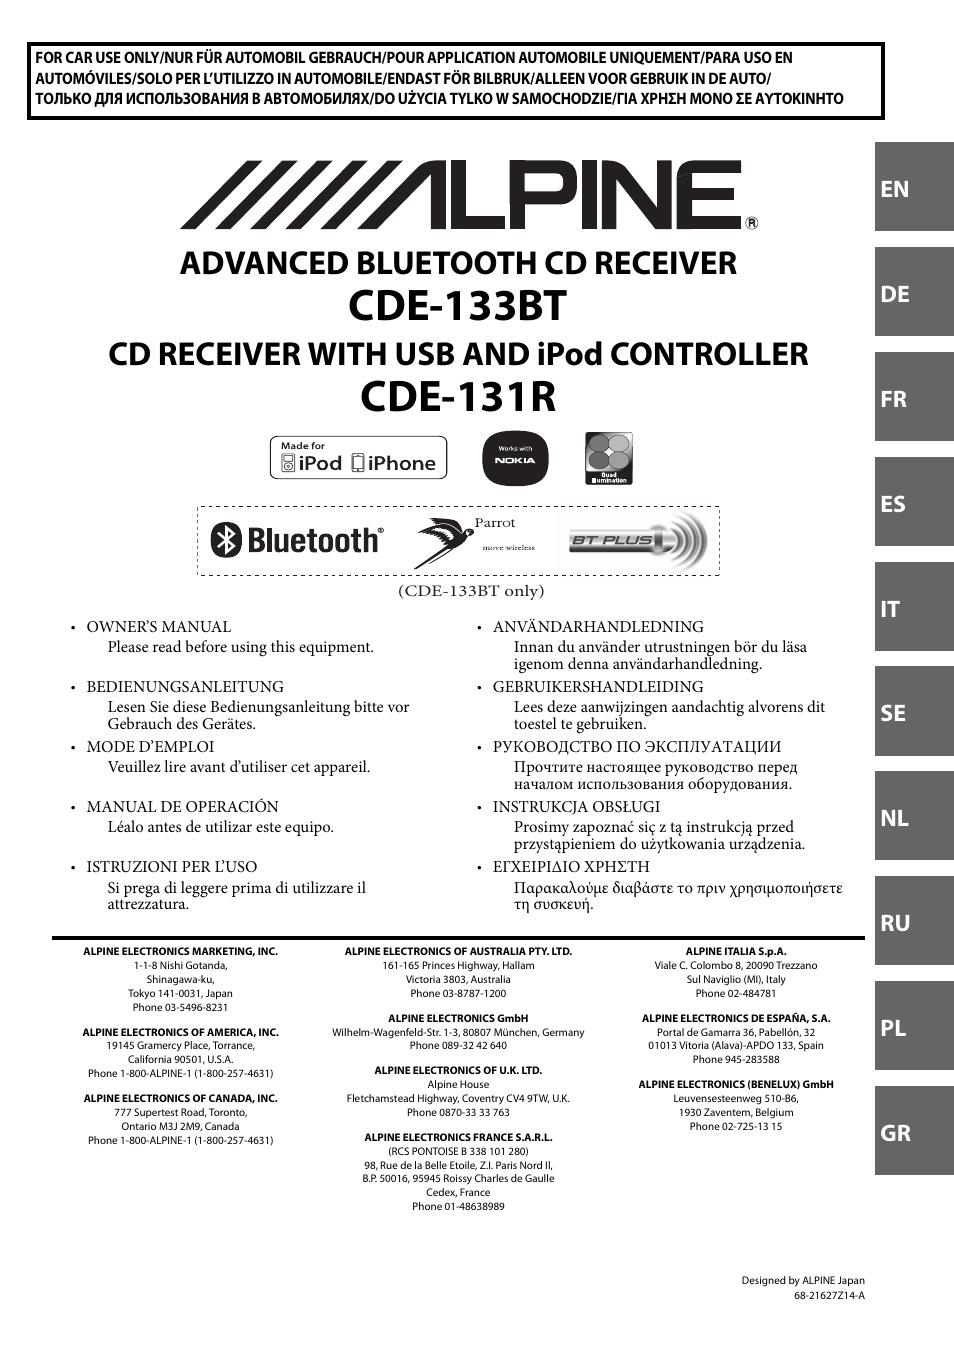 Sony HCD-H881, HCD-H881D, MHC-881, MHC-D7, MHC-G88 Service